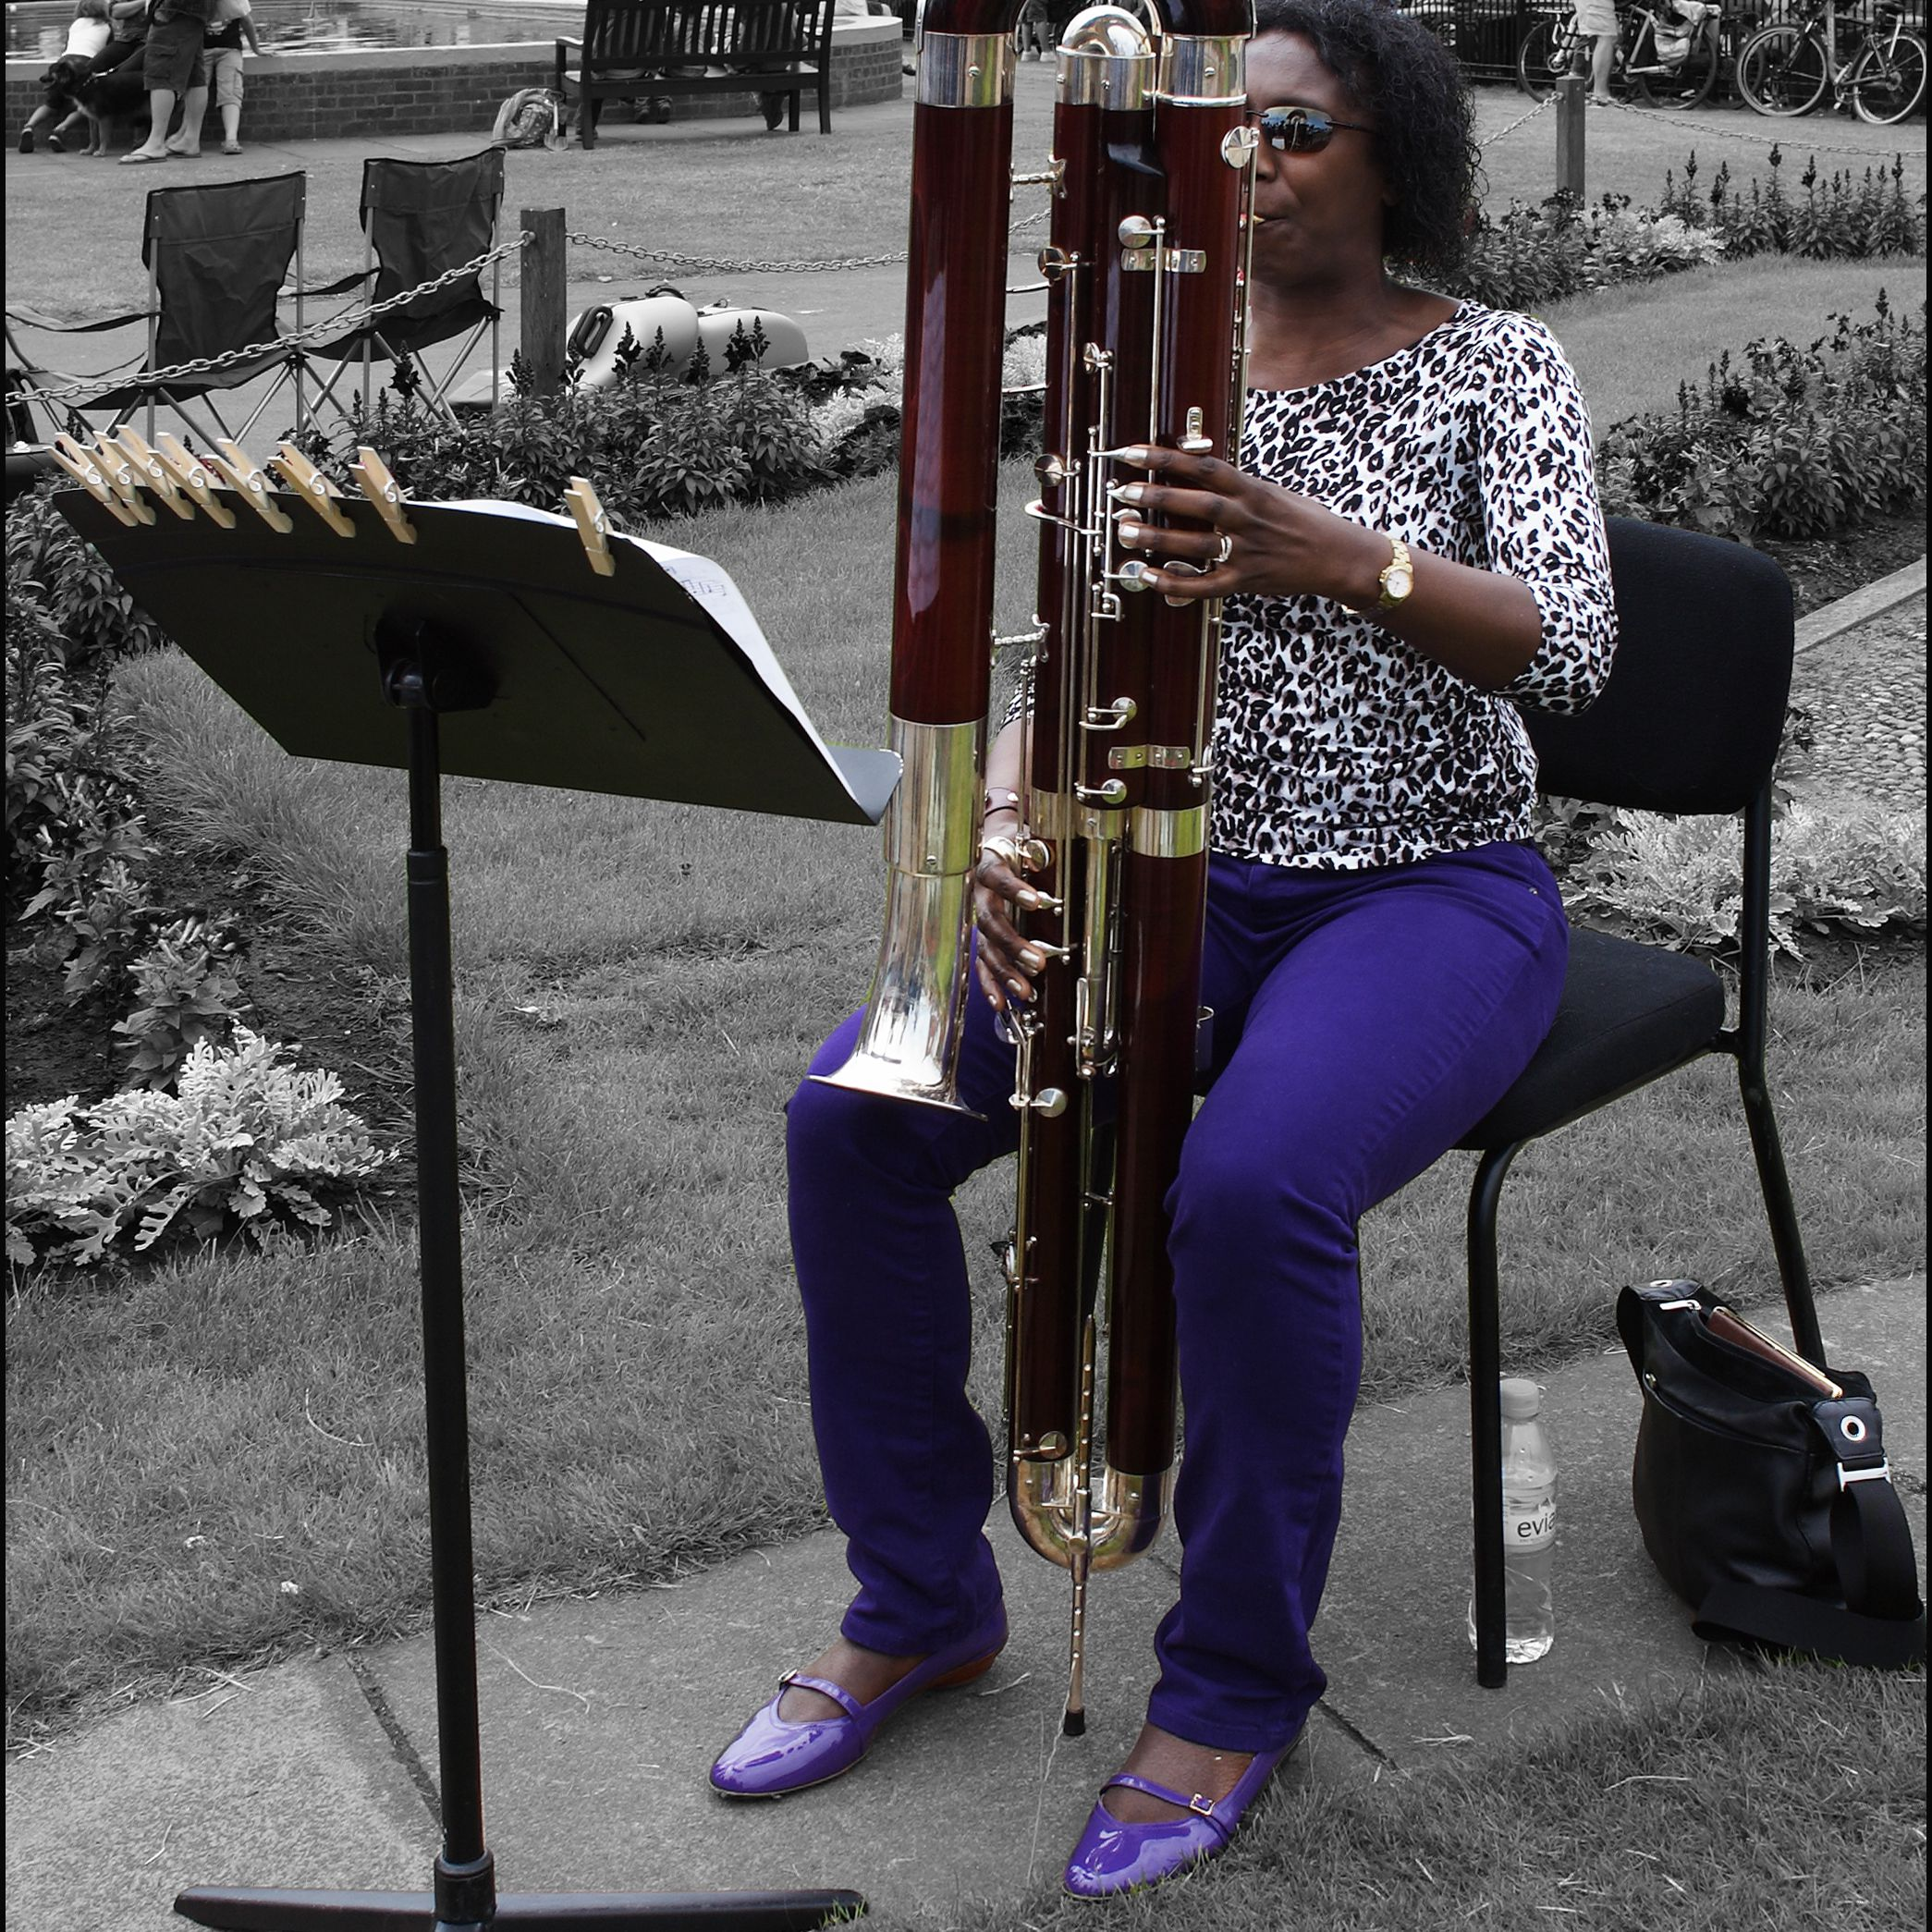 Contra-bassoonist Margaret Cookhorn